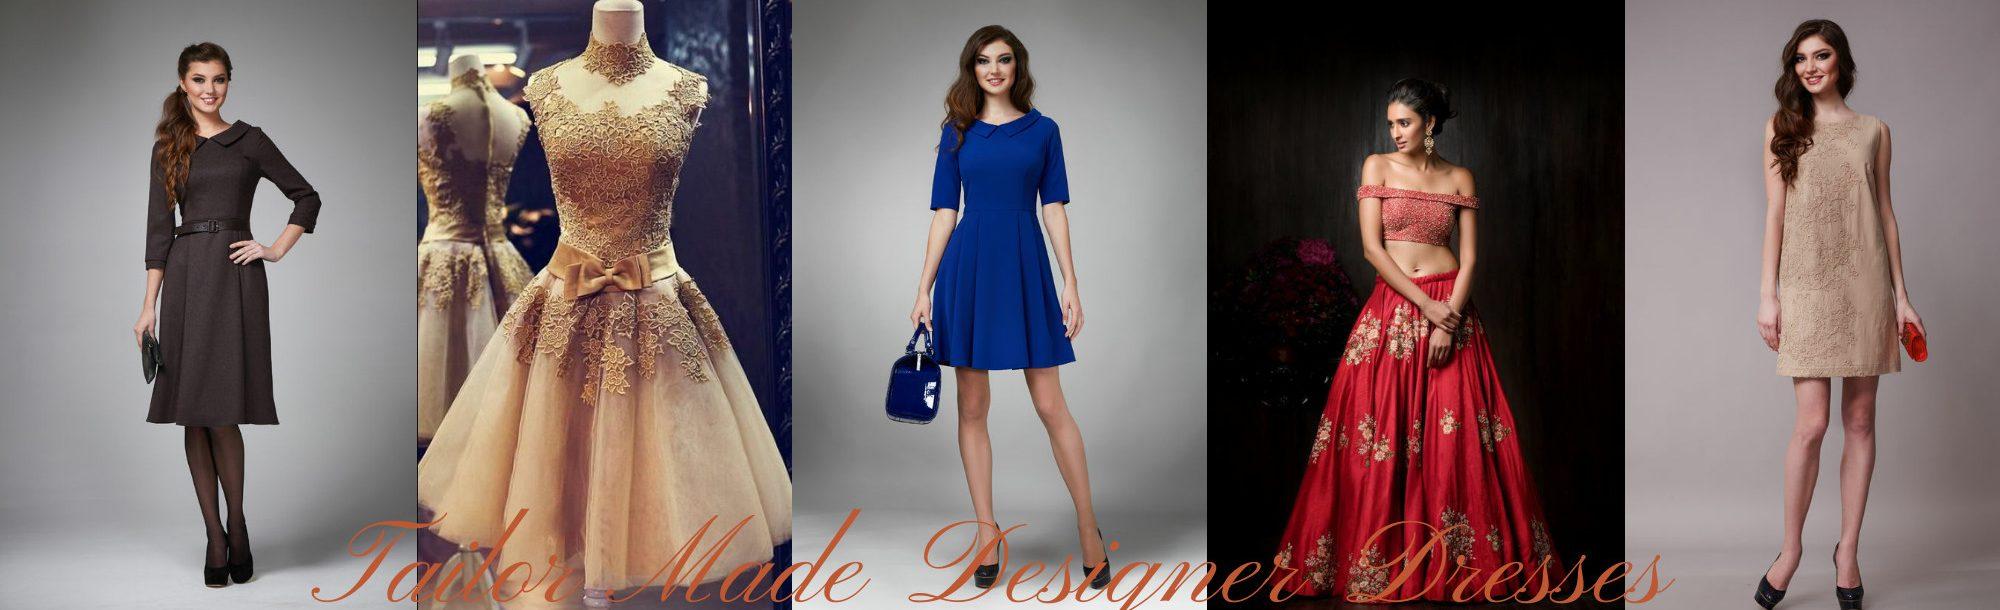 custom dress tailor, designer boutique, ladies tailor, tailors, best anarkali, online lehenga tailor, dress tailors